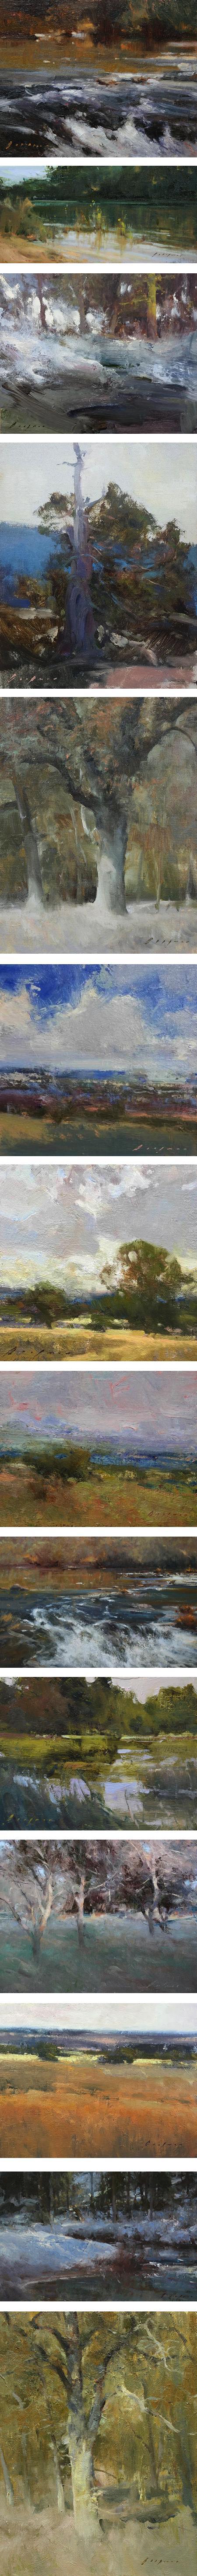 Simon Addyman, landscape paintings